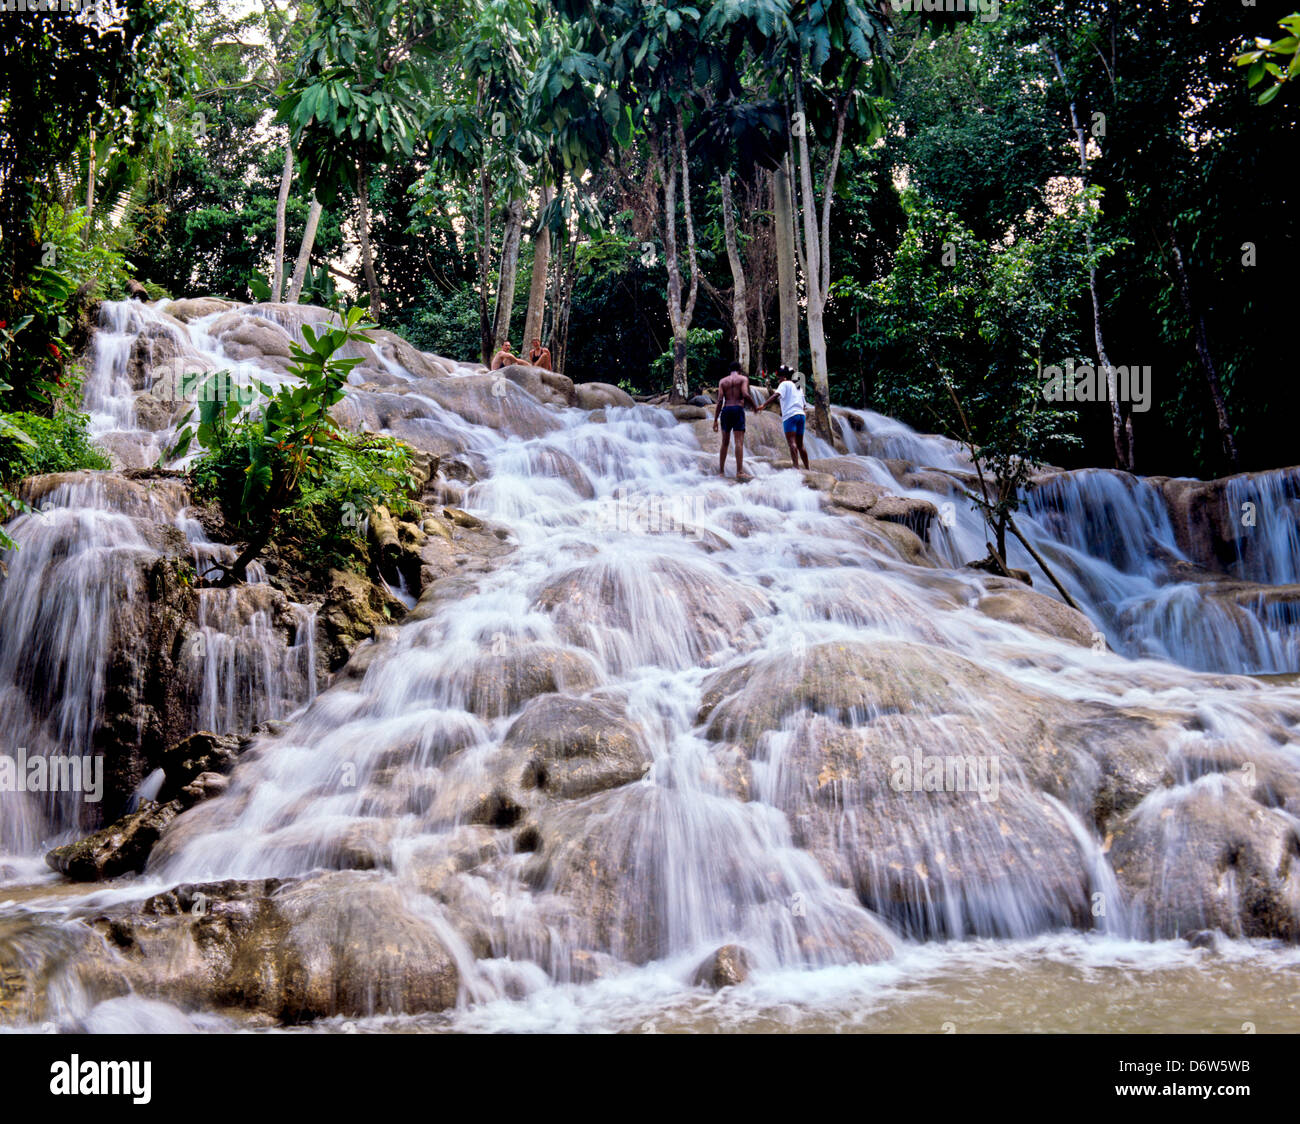 8415. Dunn's River Falls, Ocho Rios, Jamaica, Caribbean, West Indies - Stock Image